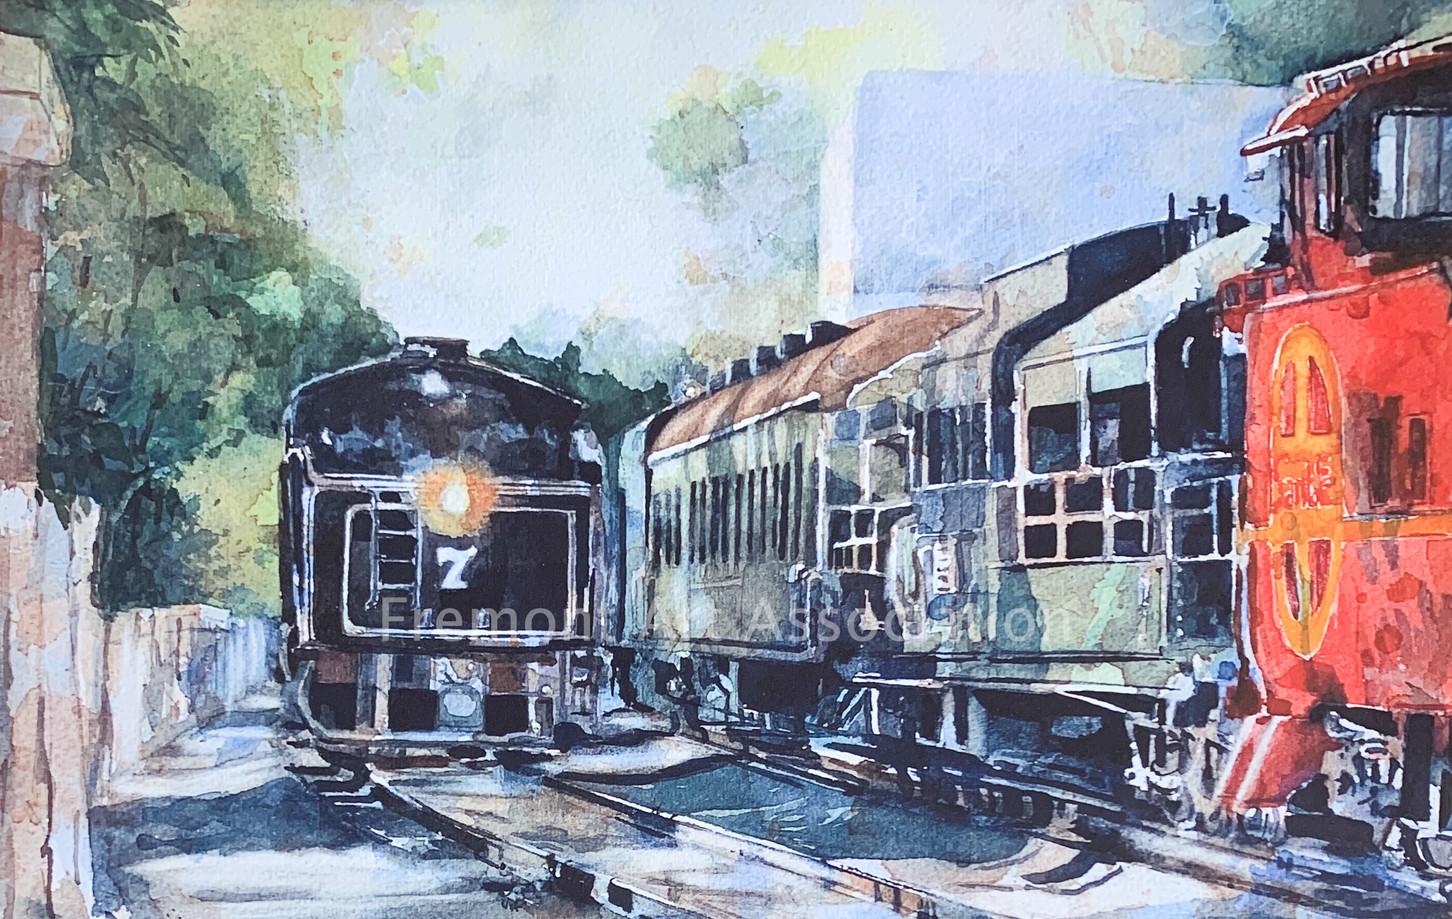 """Niles Railway, Colombia Line"""